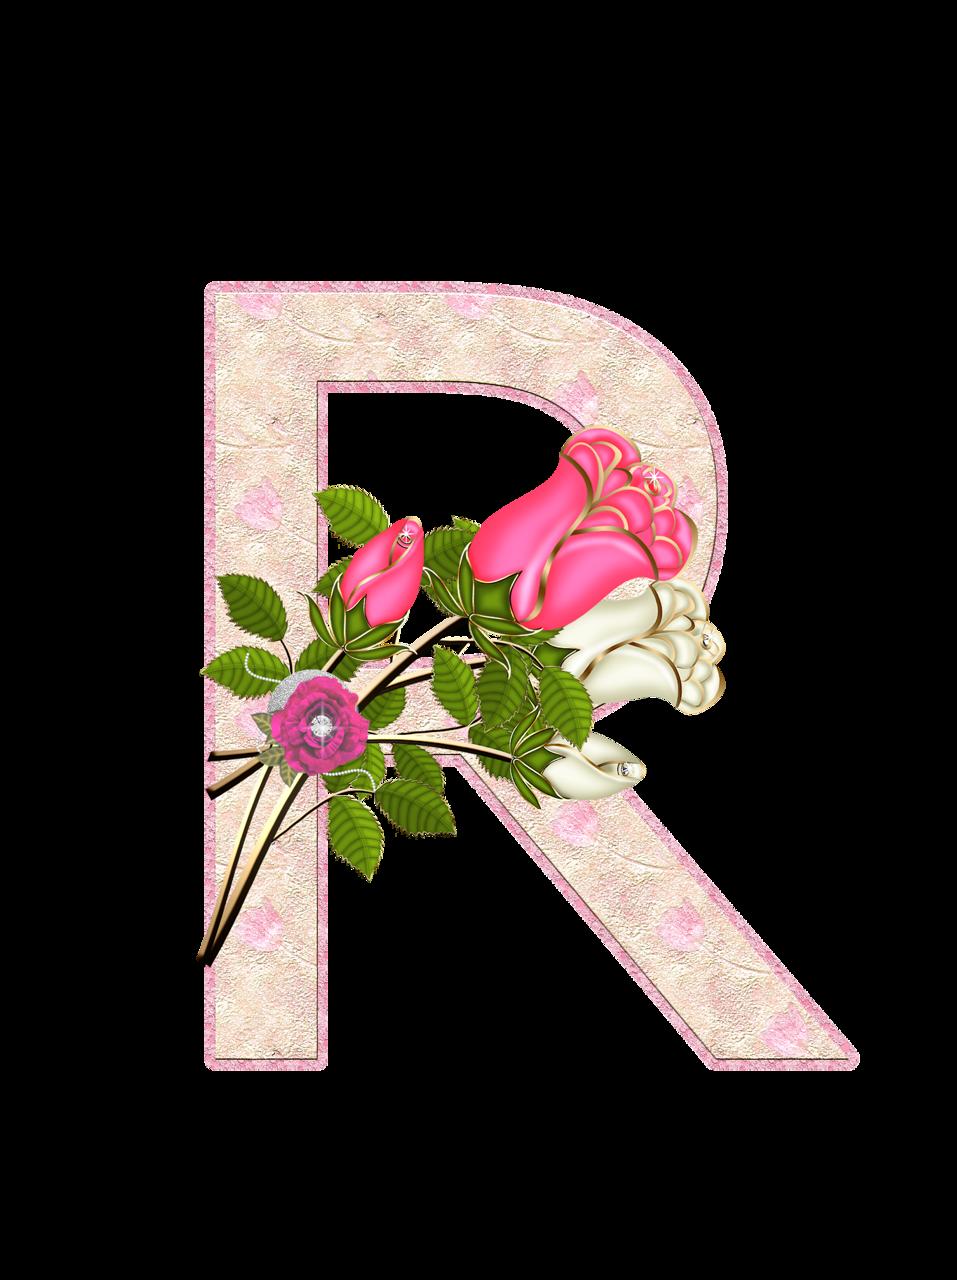 Alphabet flower clipart vector library stock FLORES Y LETRAS PARA DECOUPAGE | Decoupage, Alphabet letters and ... vector library stock